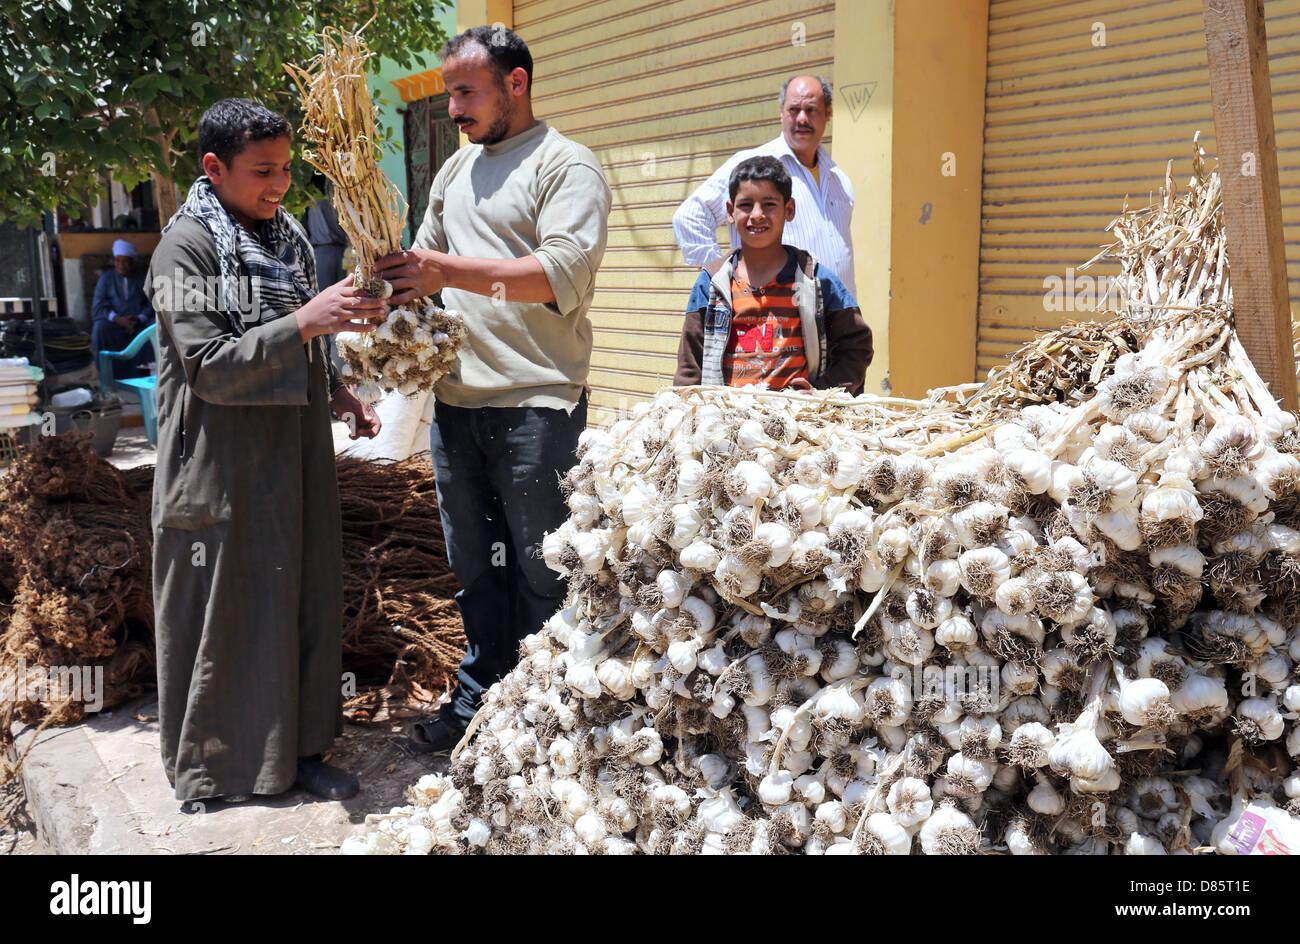 Market stall with garlic in Al Ghanayem, Upper Egypt - Stock Image